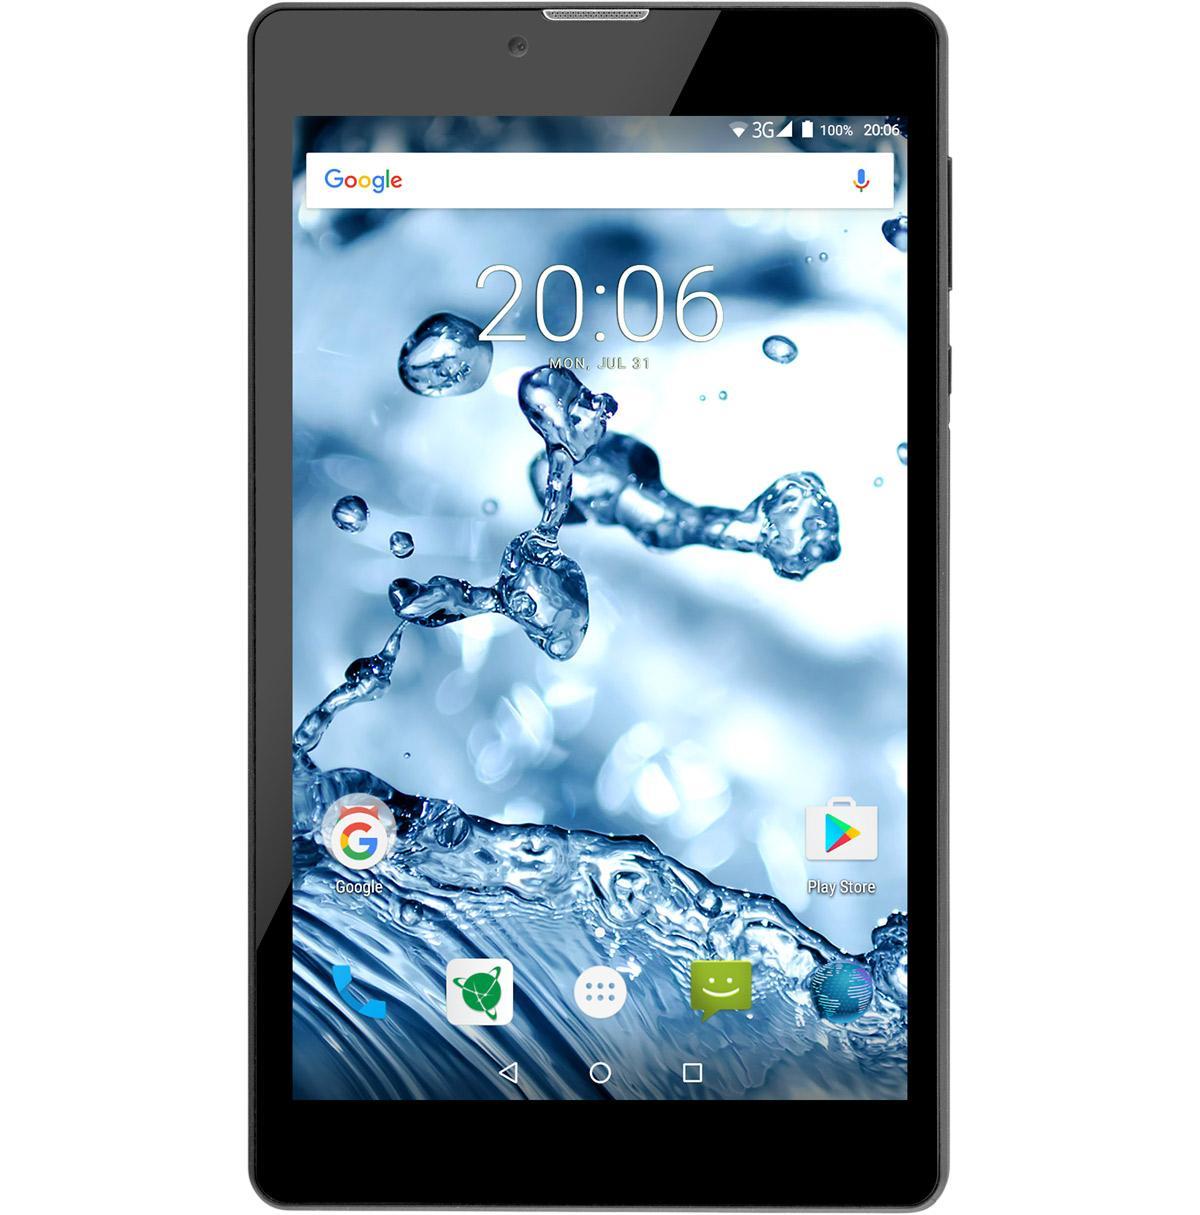 NAVT5003G NAVITEL Bluetooth: Ja, Android 7.0, 2G/3G Navigationssystem NAVT5003G günstig kaufen